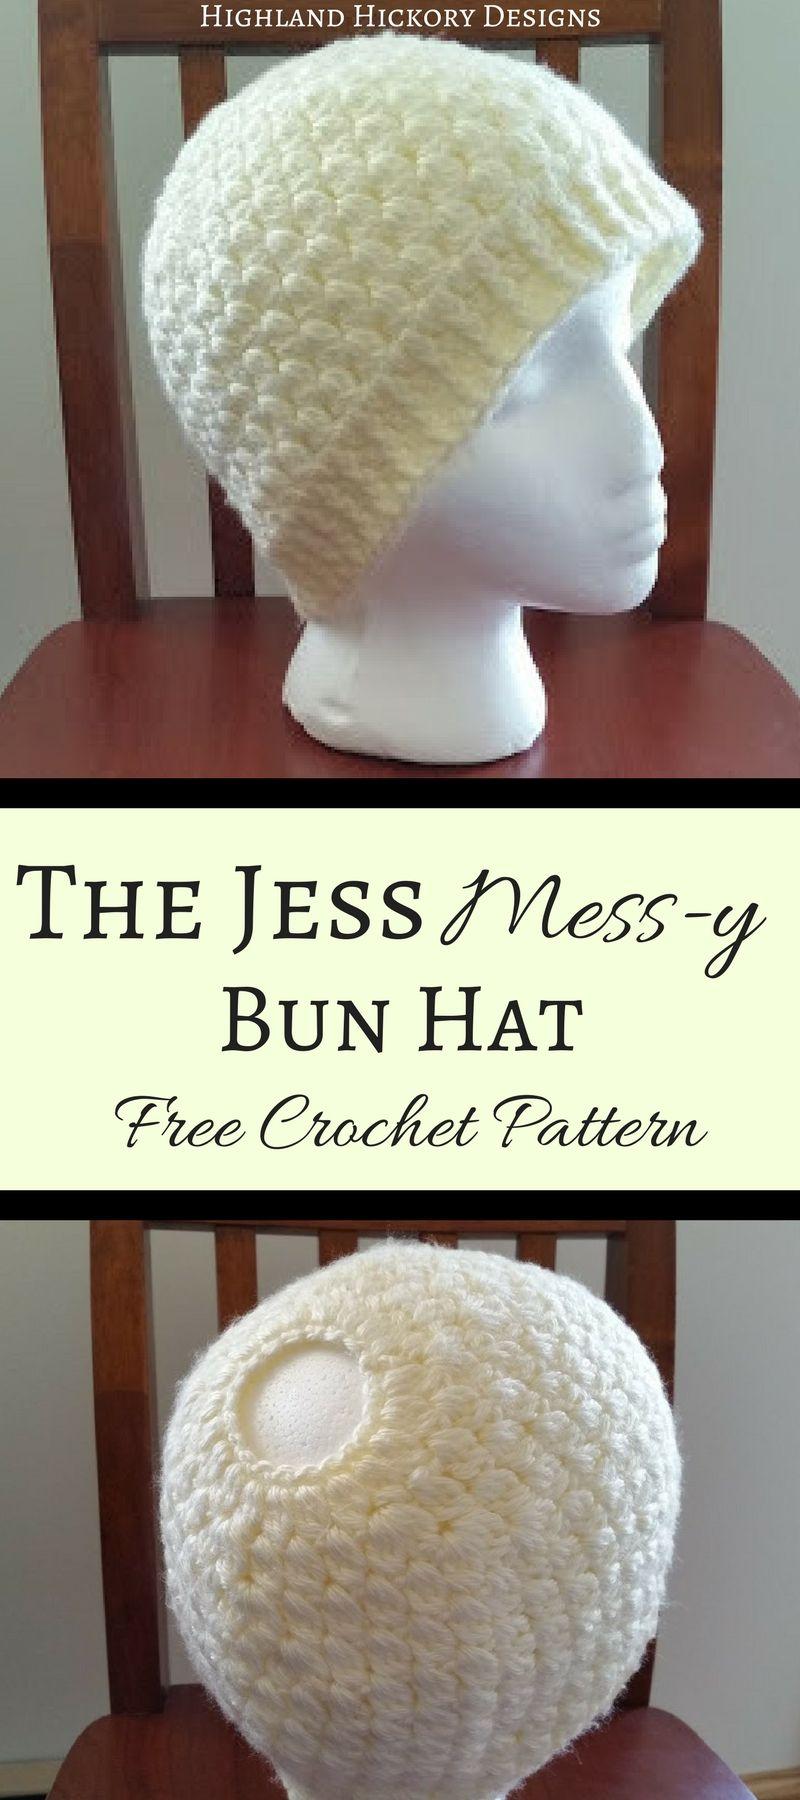 Jess Mess-y Bun Hat - Free Crochet Pattern | CrochetHolic ...